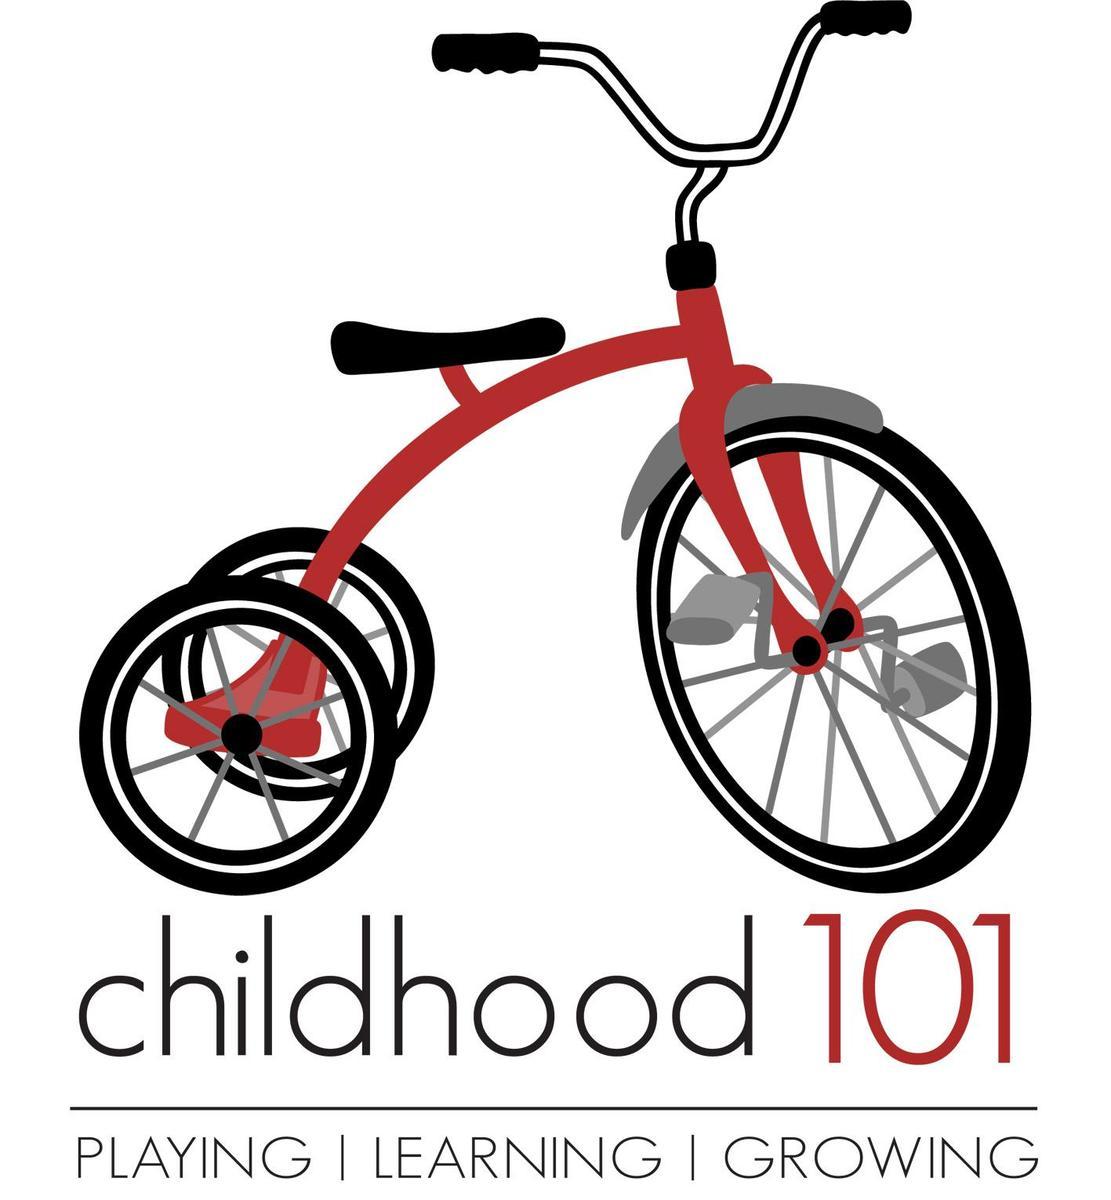 childhood101 logo